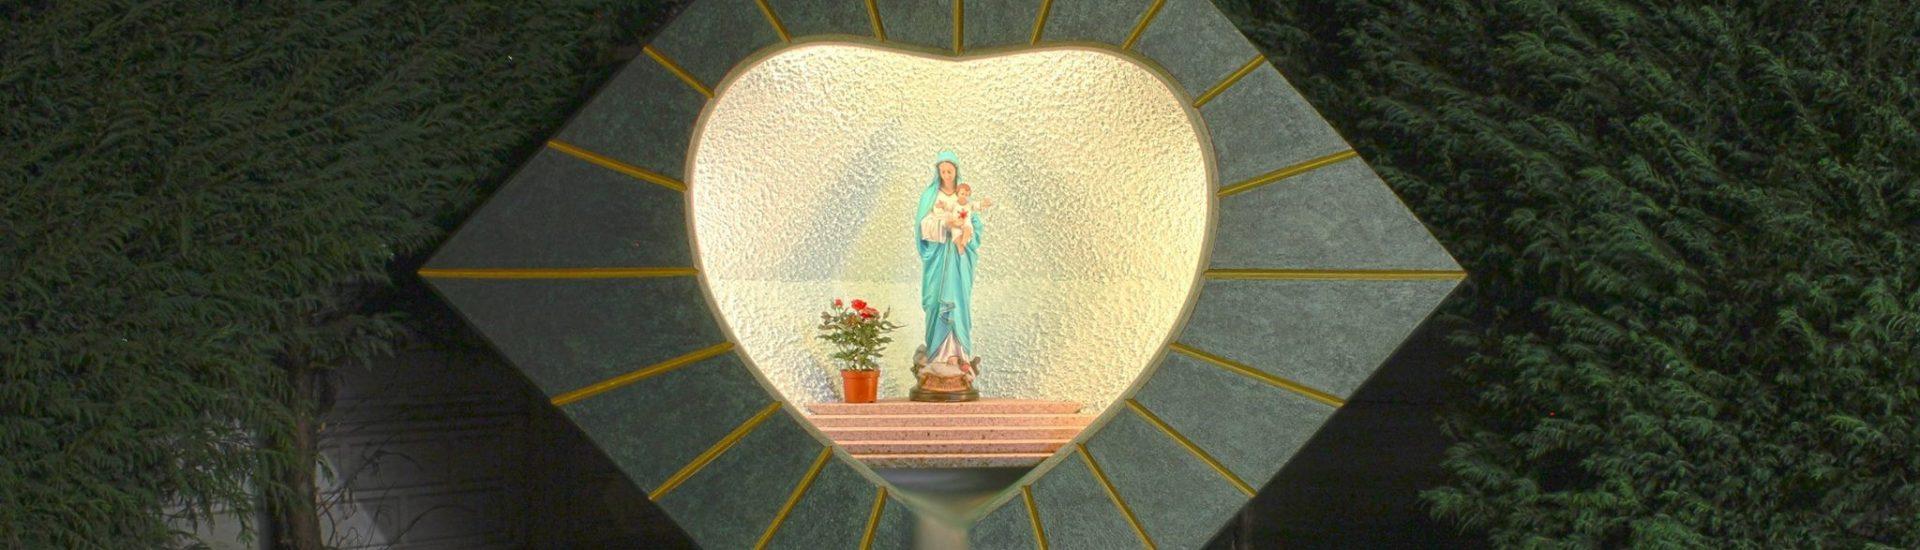 Grotta della Madonna Olmina